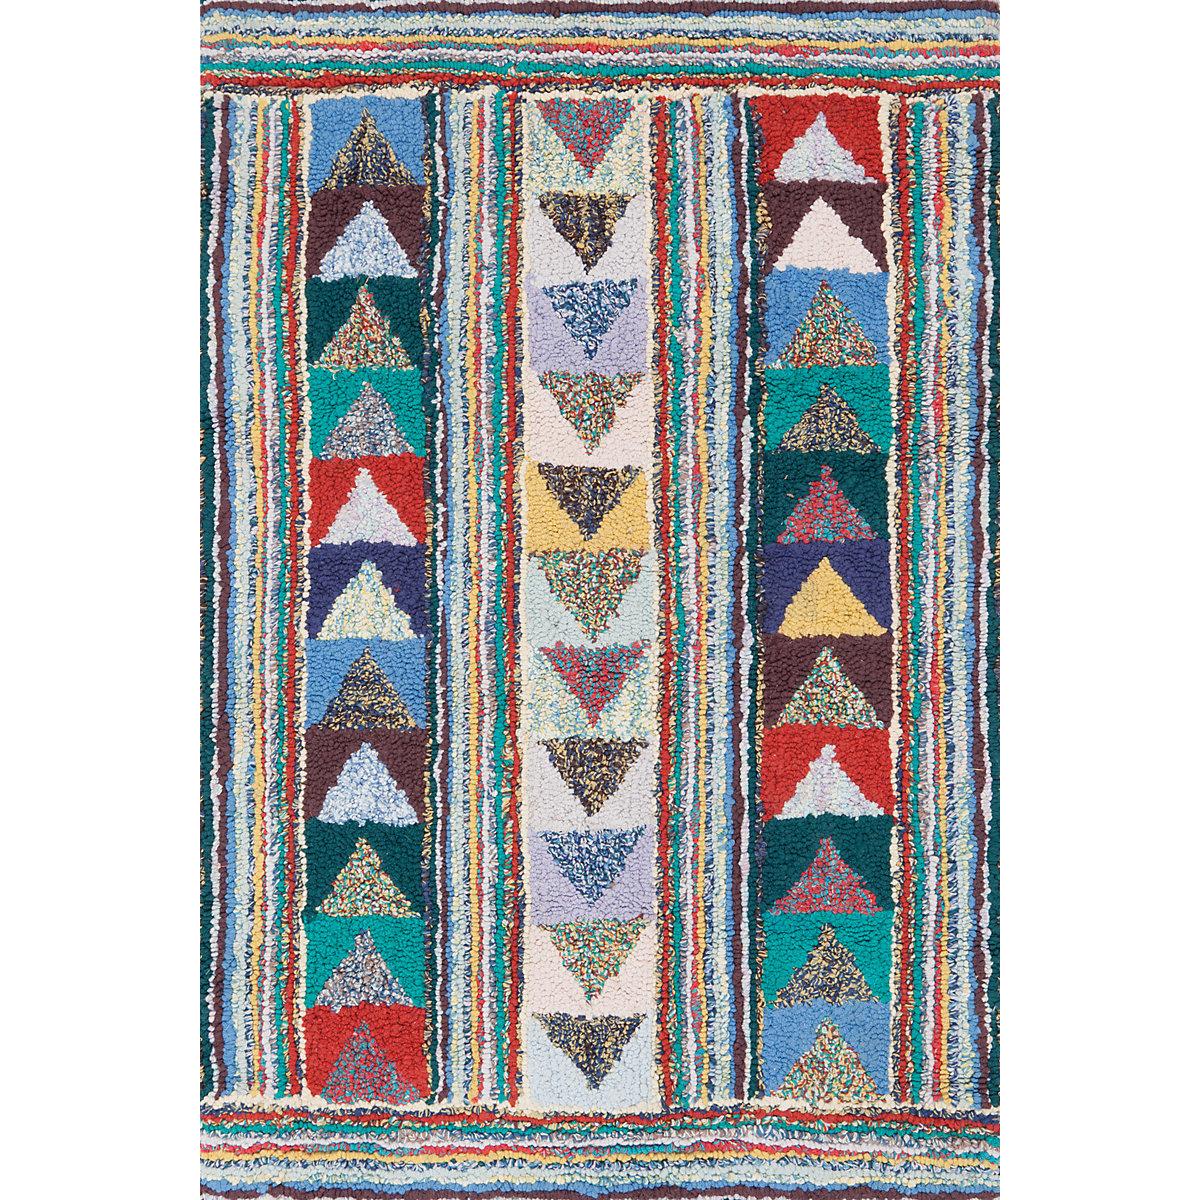 Follow The Arrows Cotton Yarn Hooked Rug